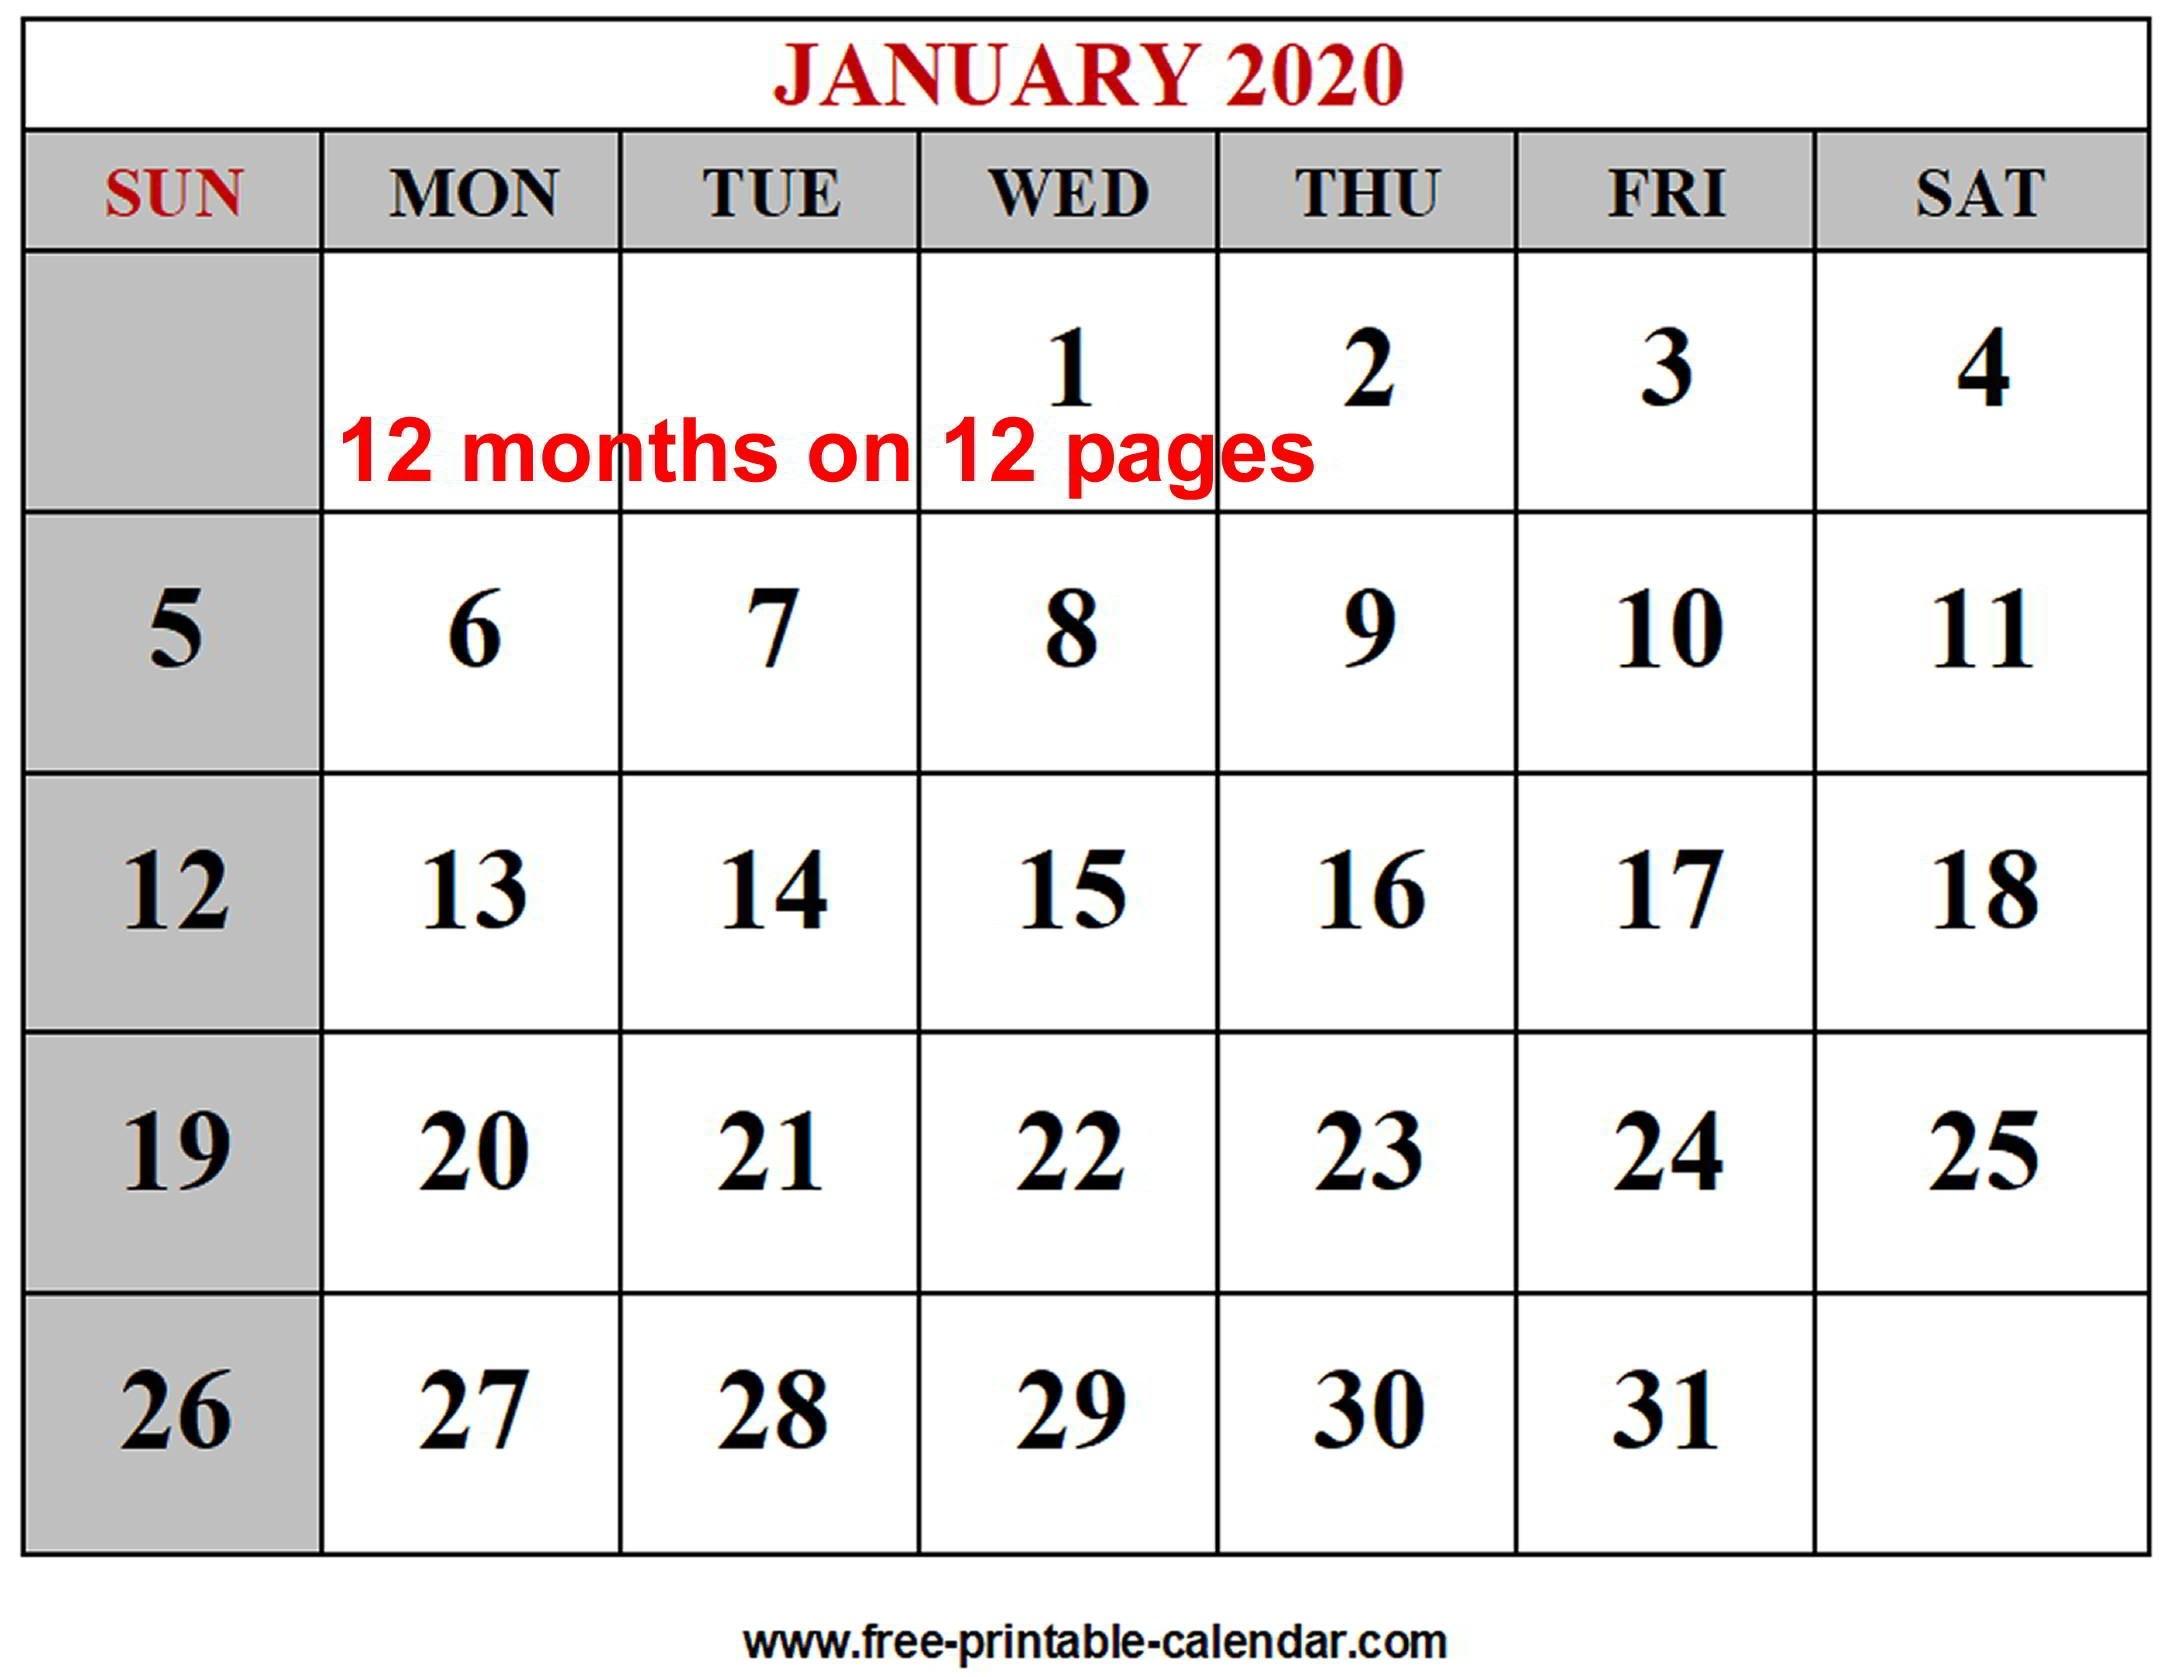 Year 2020 Calendar Templates - Free-Printable-Calendar  12 Month Calendar Free Printable